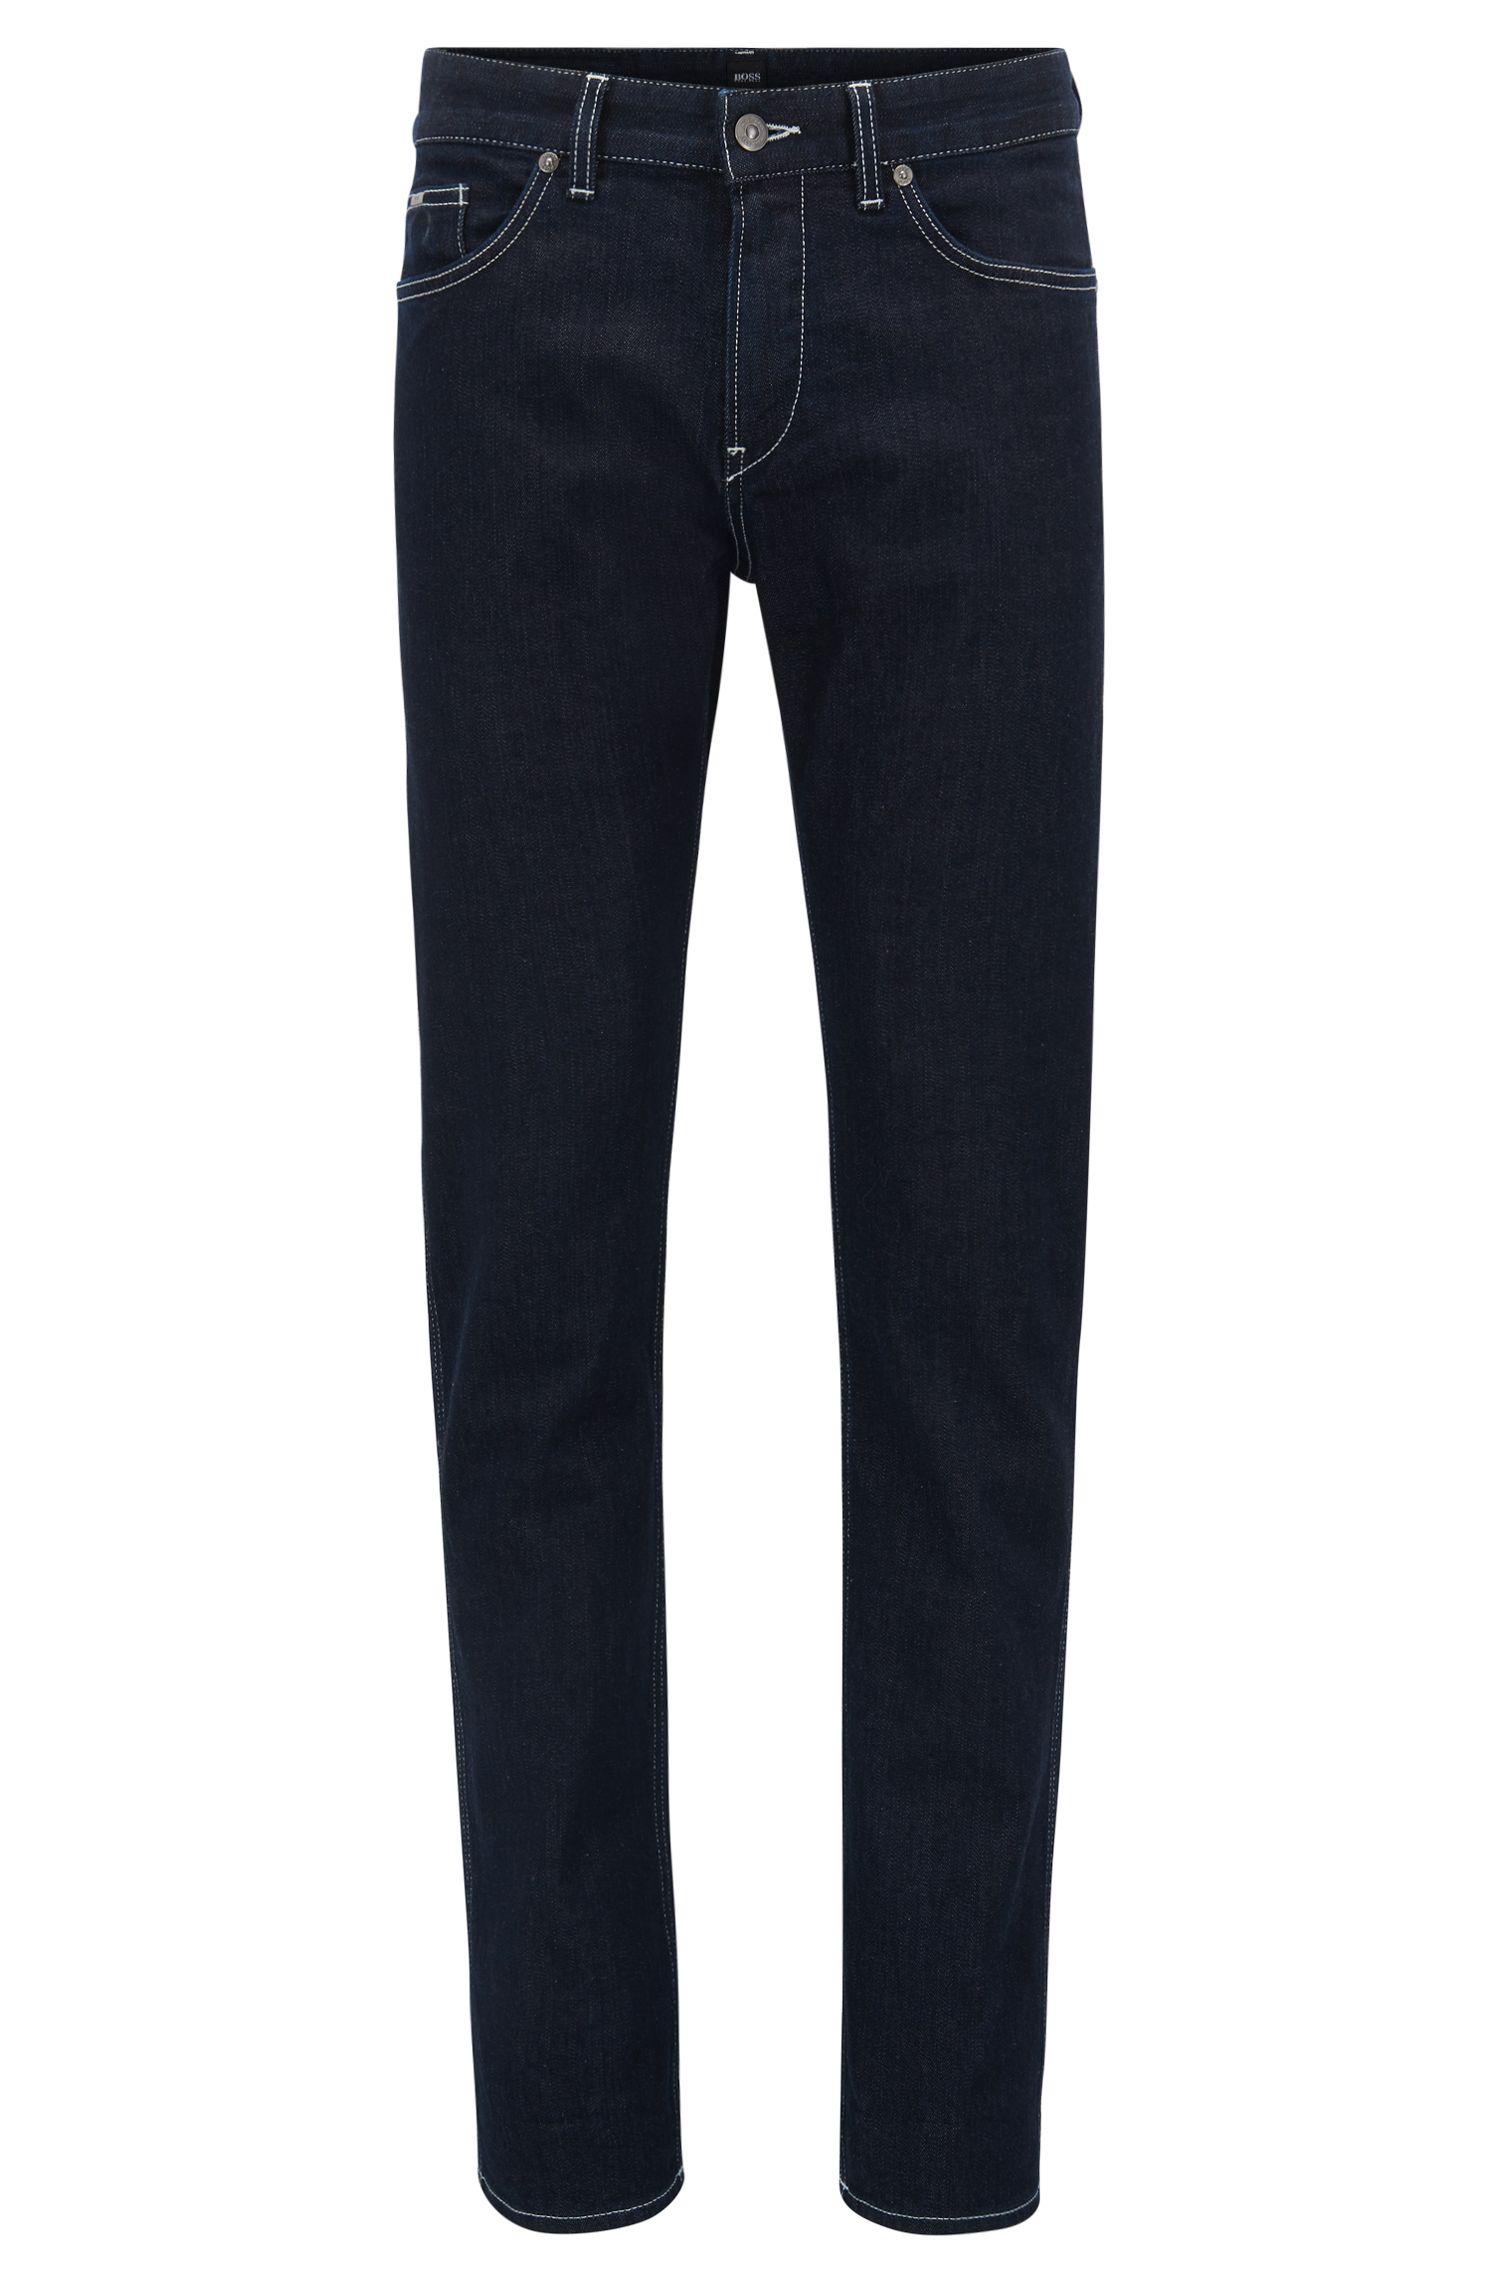 Slim-fit jeans van donkerblauw stretchdenim met dessin binnenin